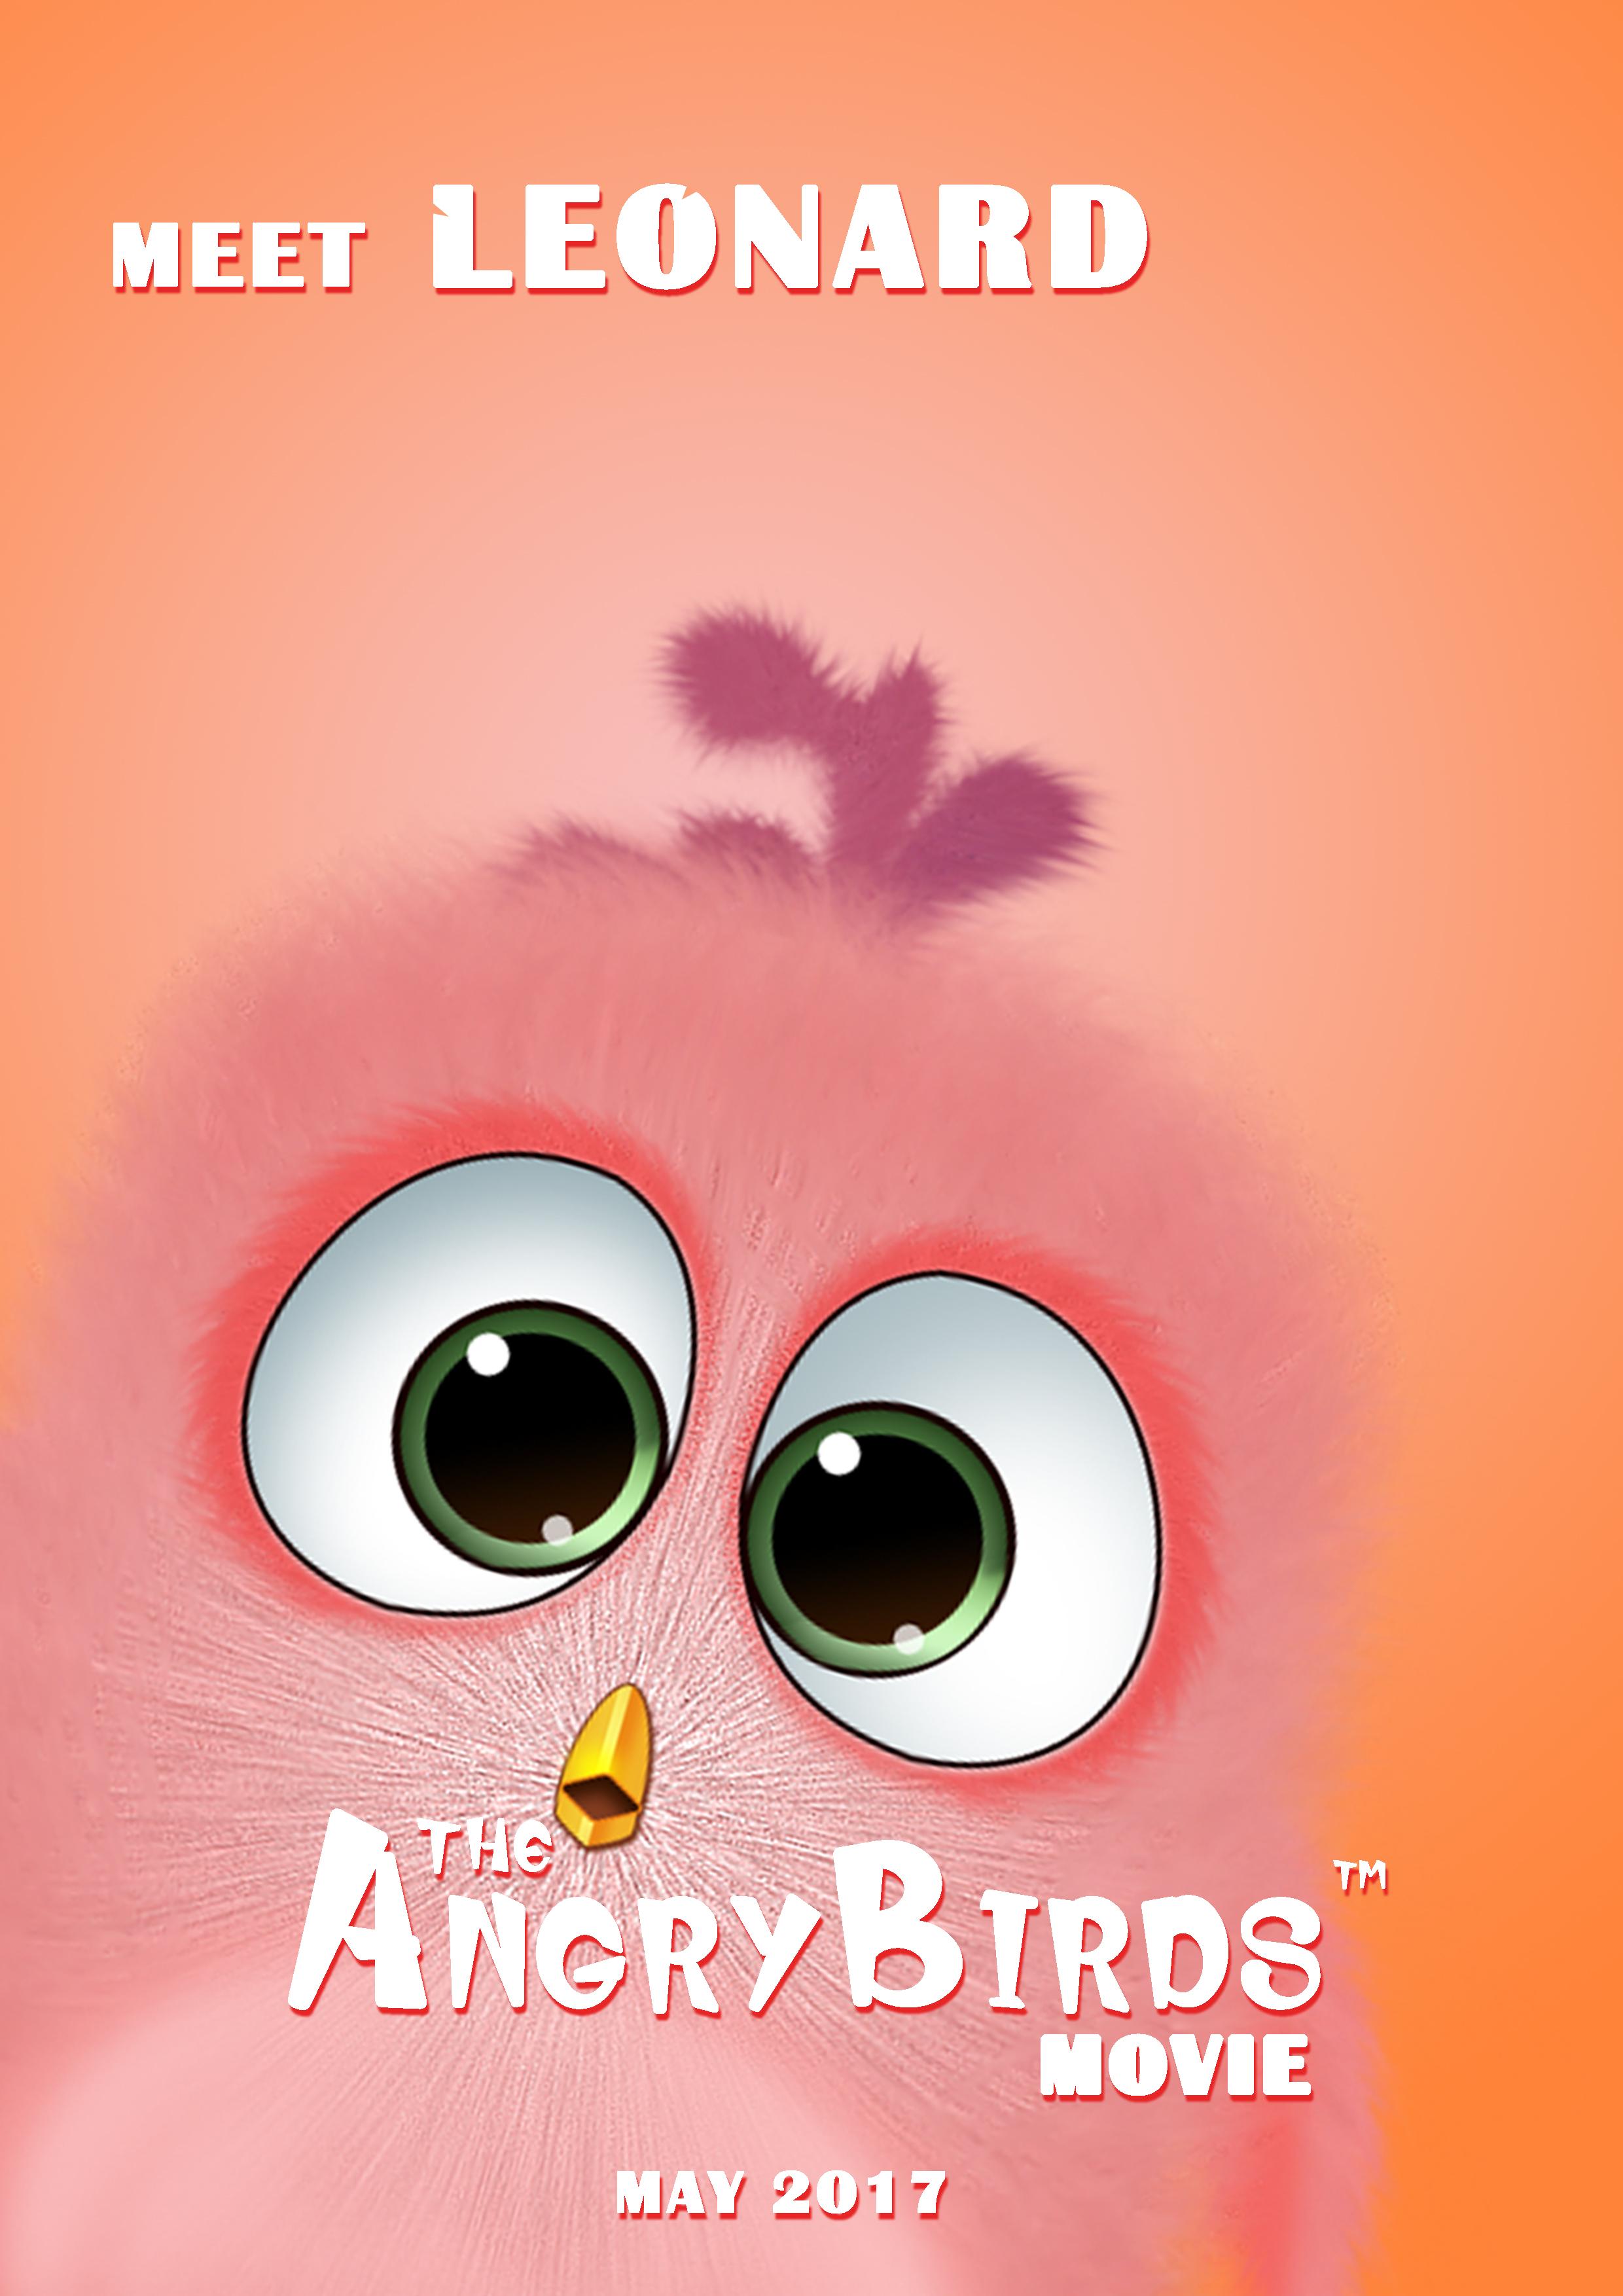 sineilY�_课间临摹 愤怒的小鸟 平面 海报 eily3 - 临摹作品